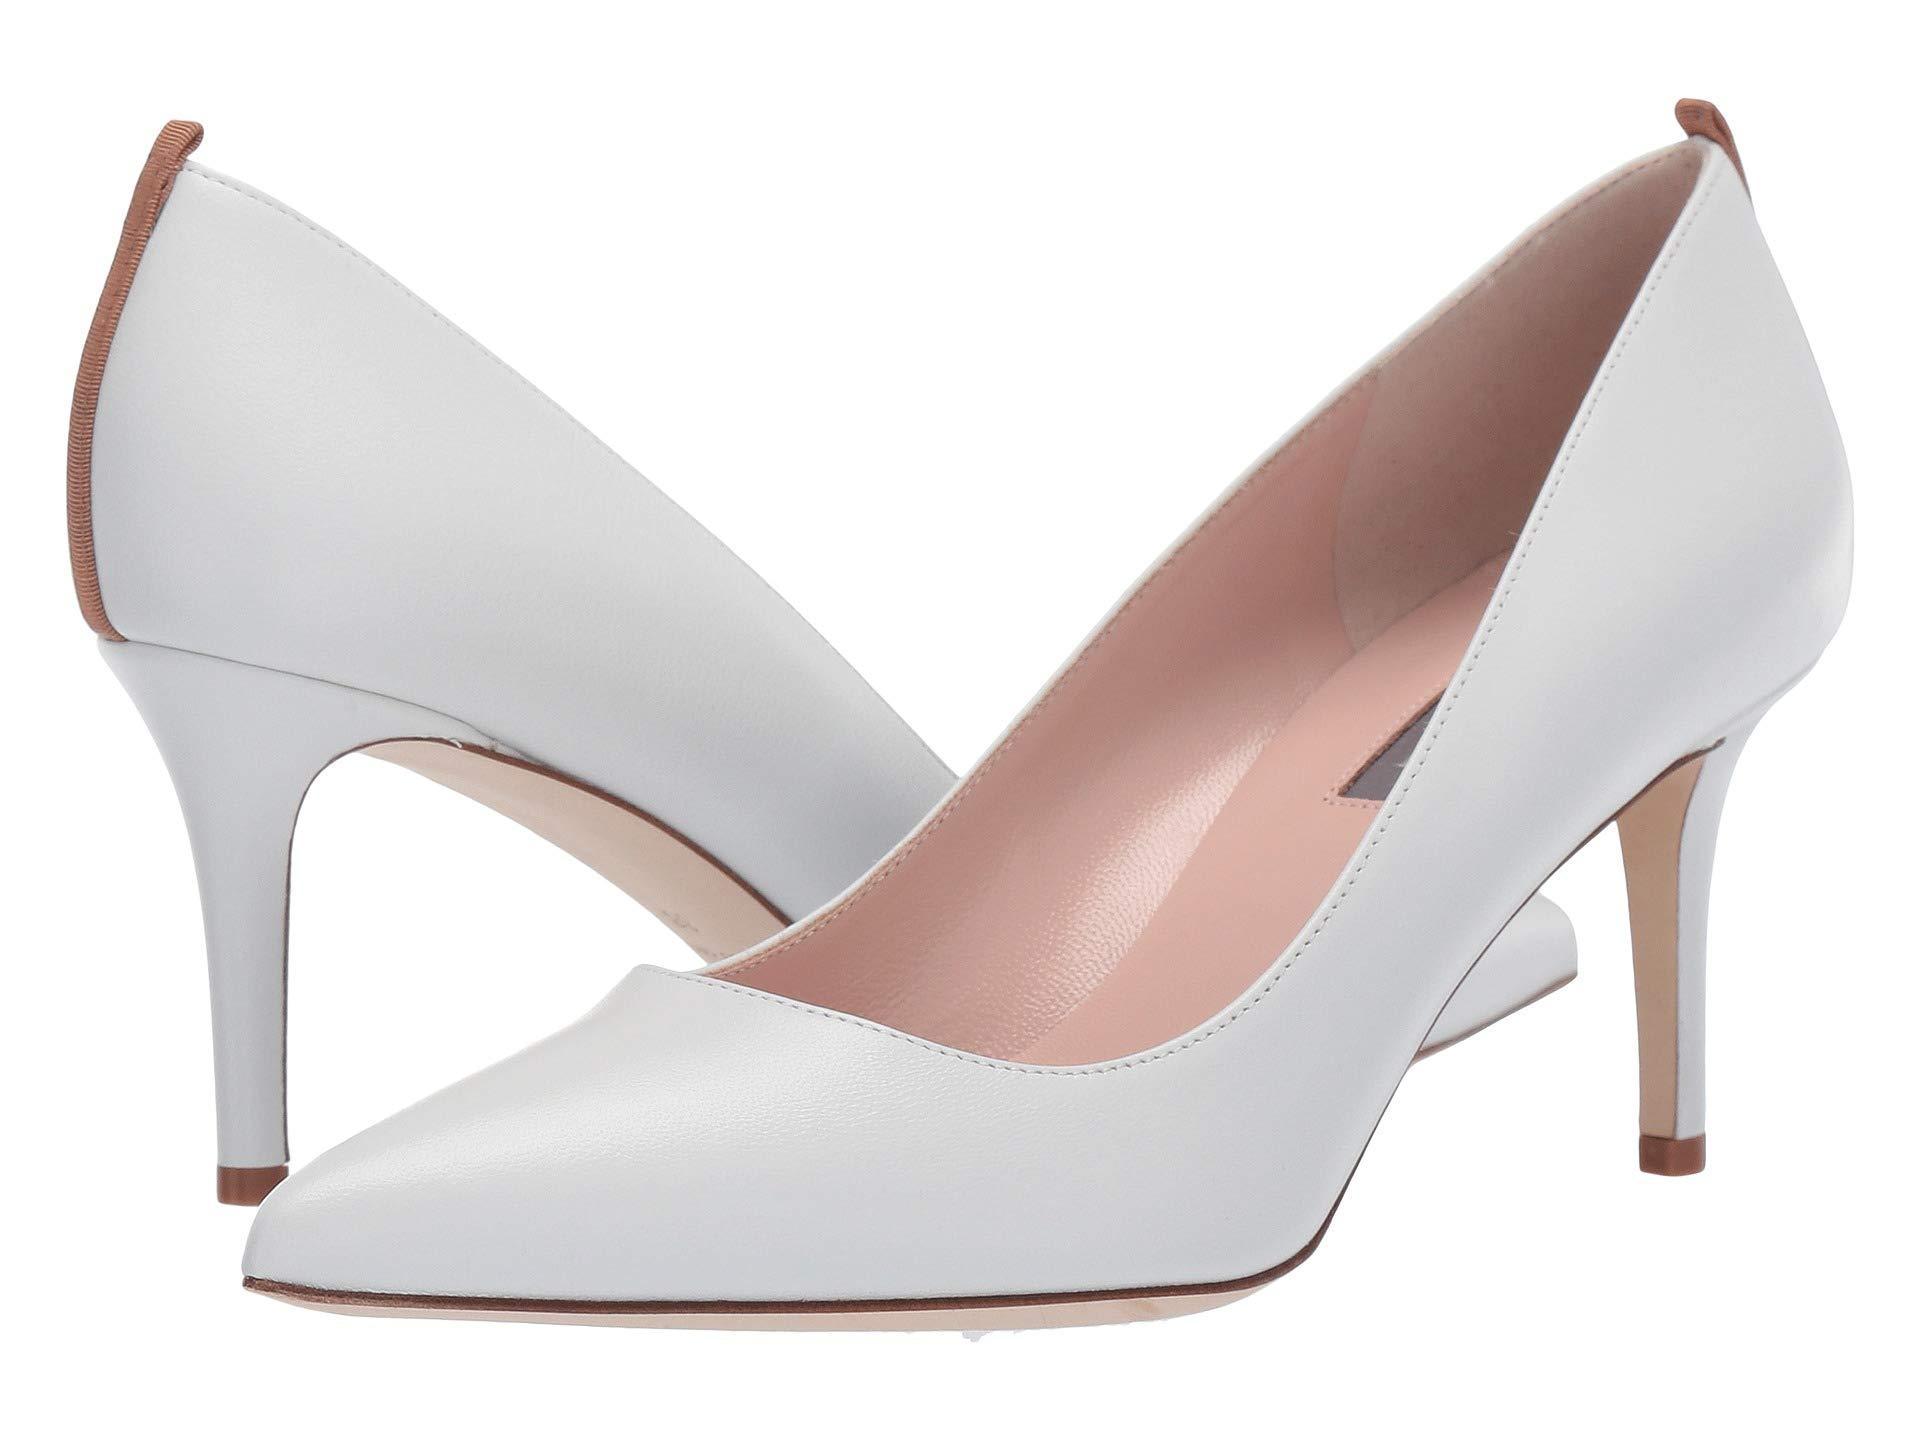 d8d593689e SJP by Sarah Jessica Parker. Fawn 70mm (marylou Tan Laser Cork) Women's  Slip-on Dress Shoes